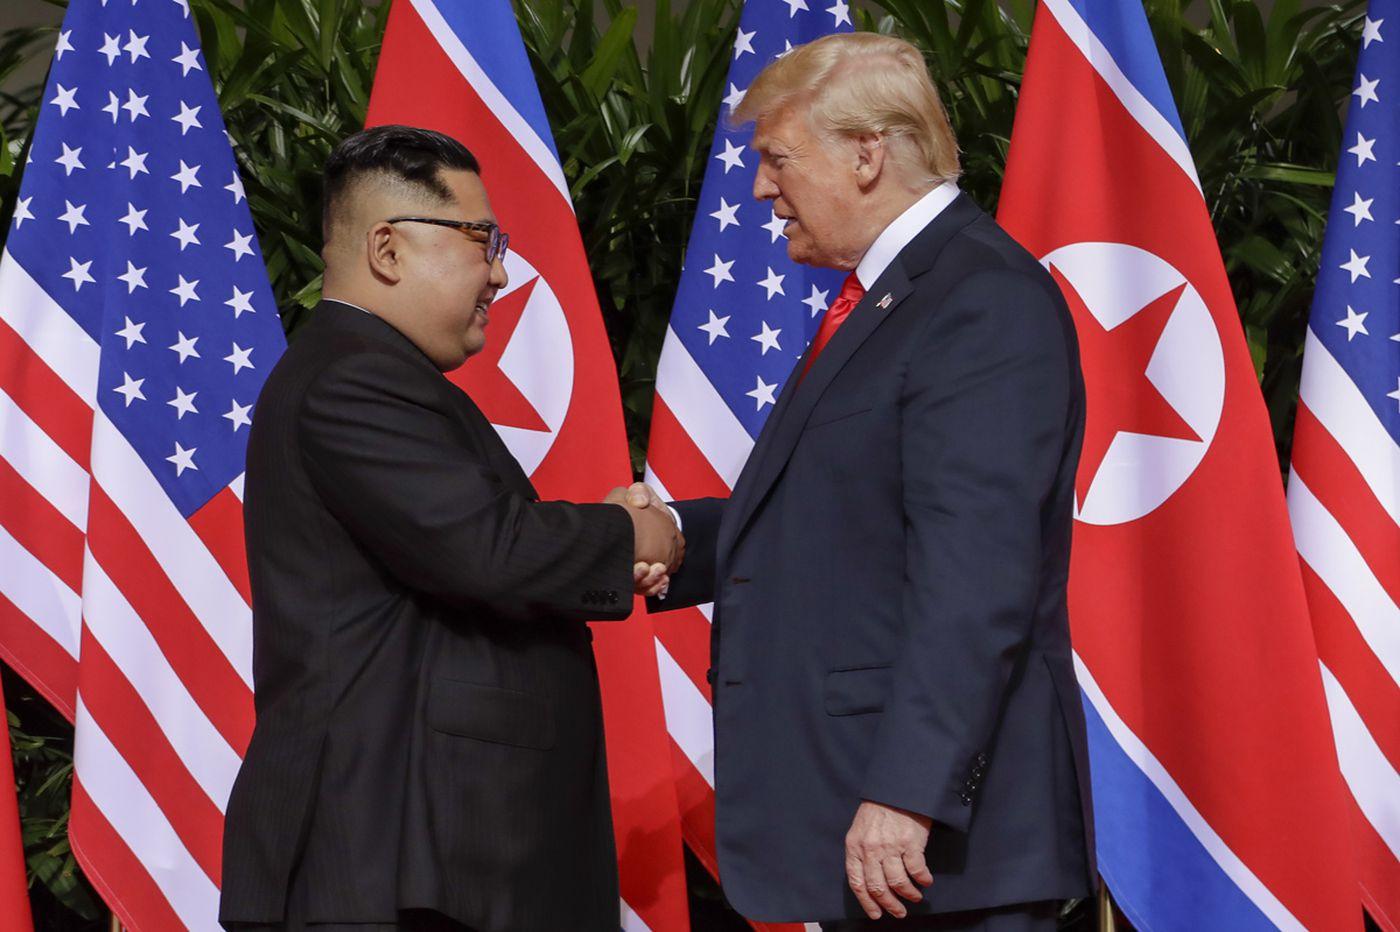 Trump-Kim summit recap: Fox News analyst calls Trump's behavior 'disconcerting'